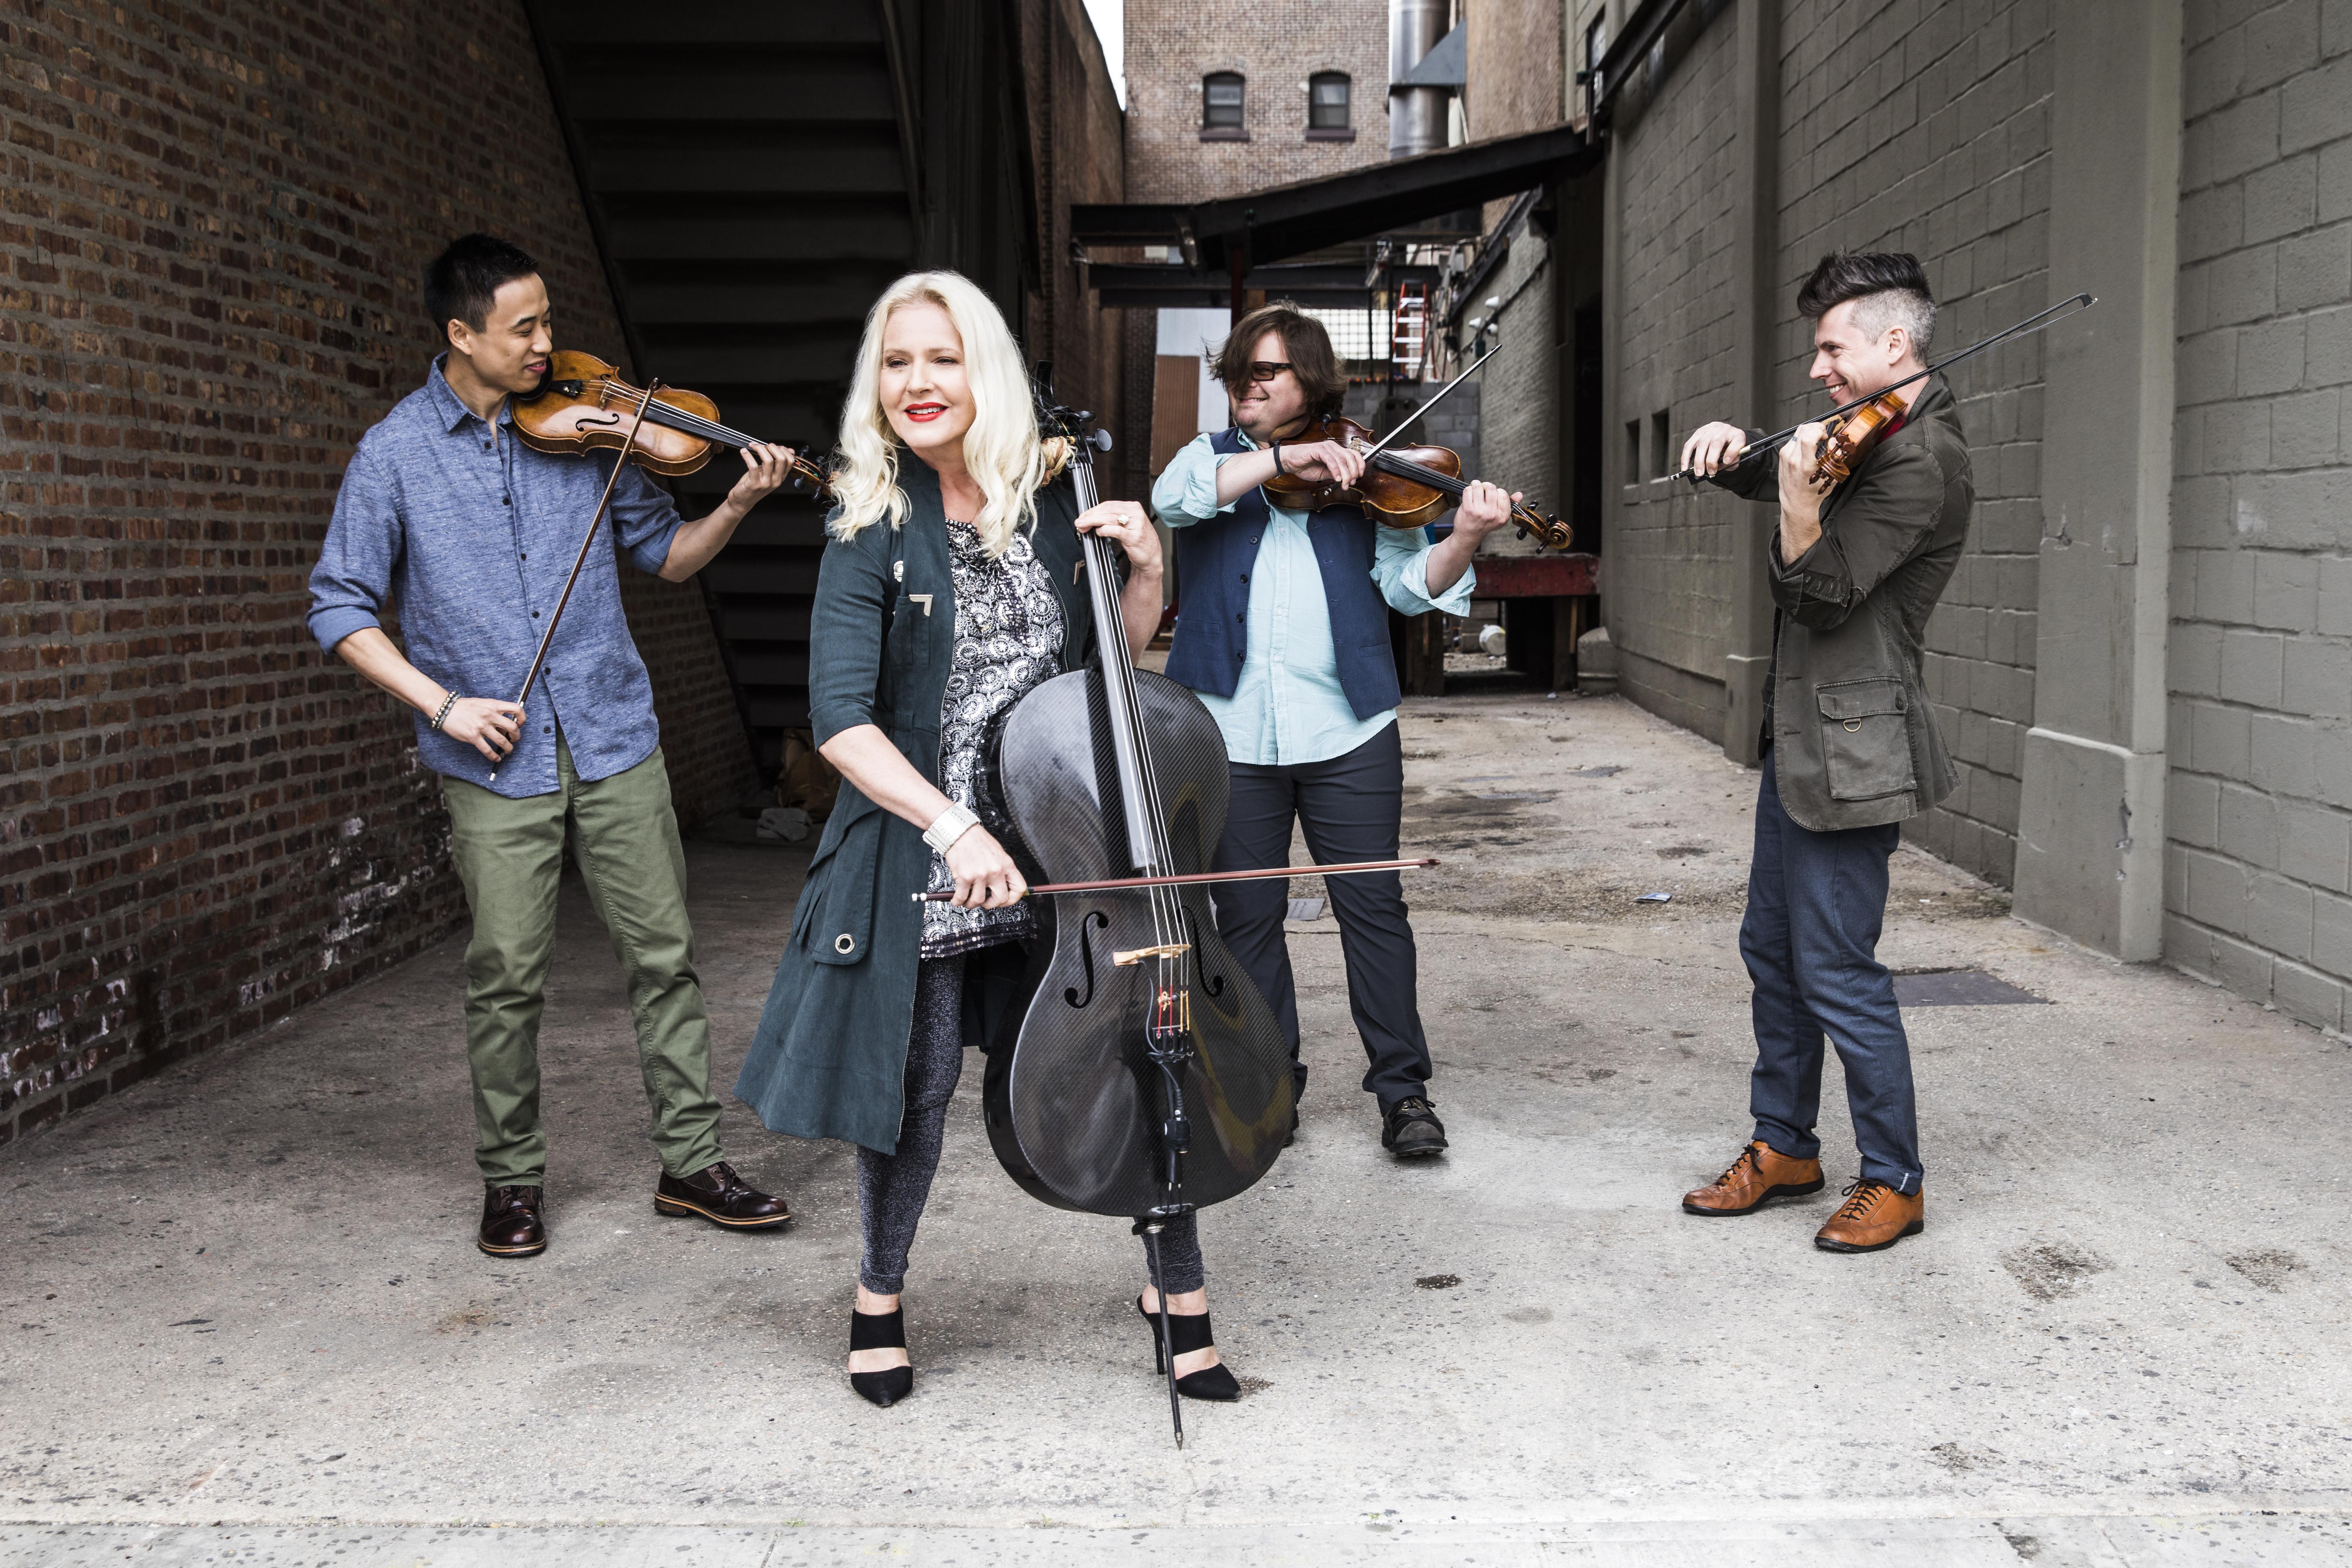 Ethel, the string quartet